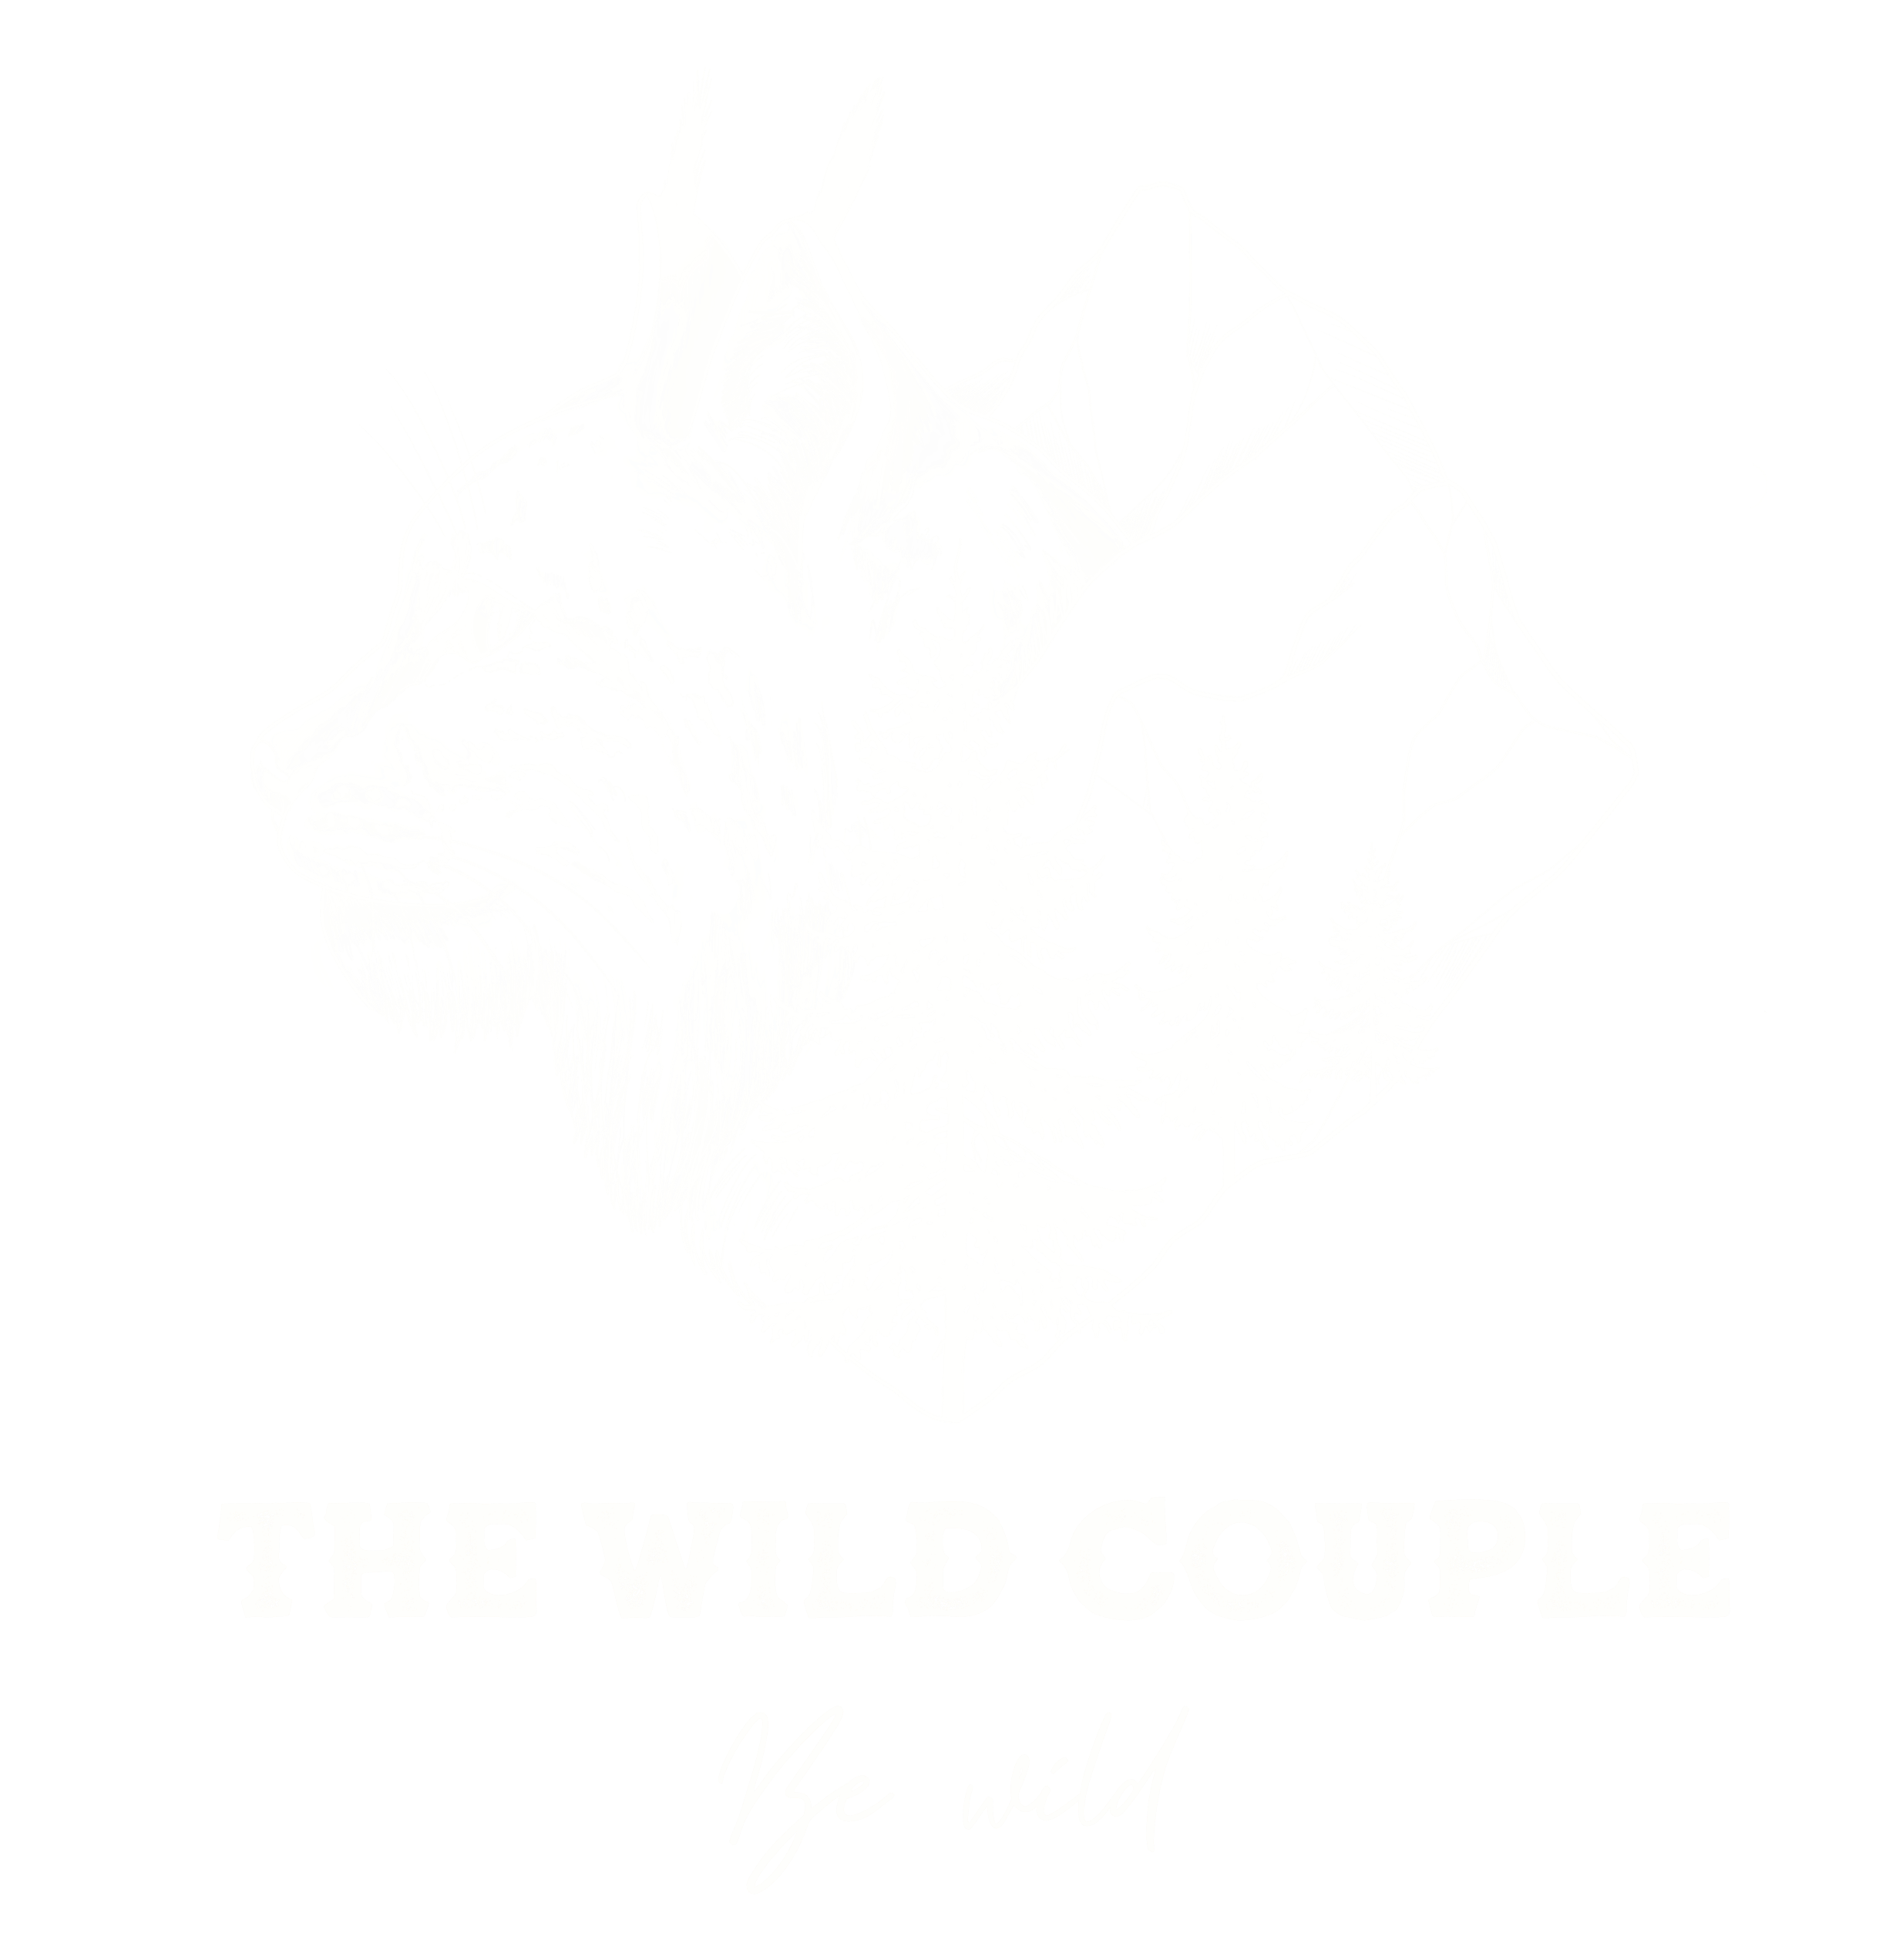 The Wild Couple Weddings